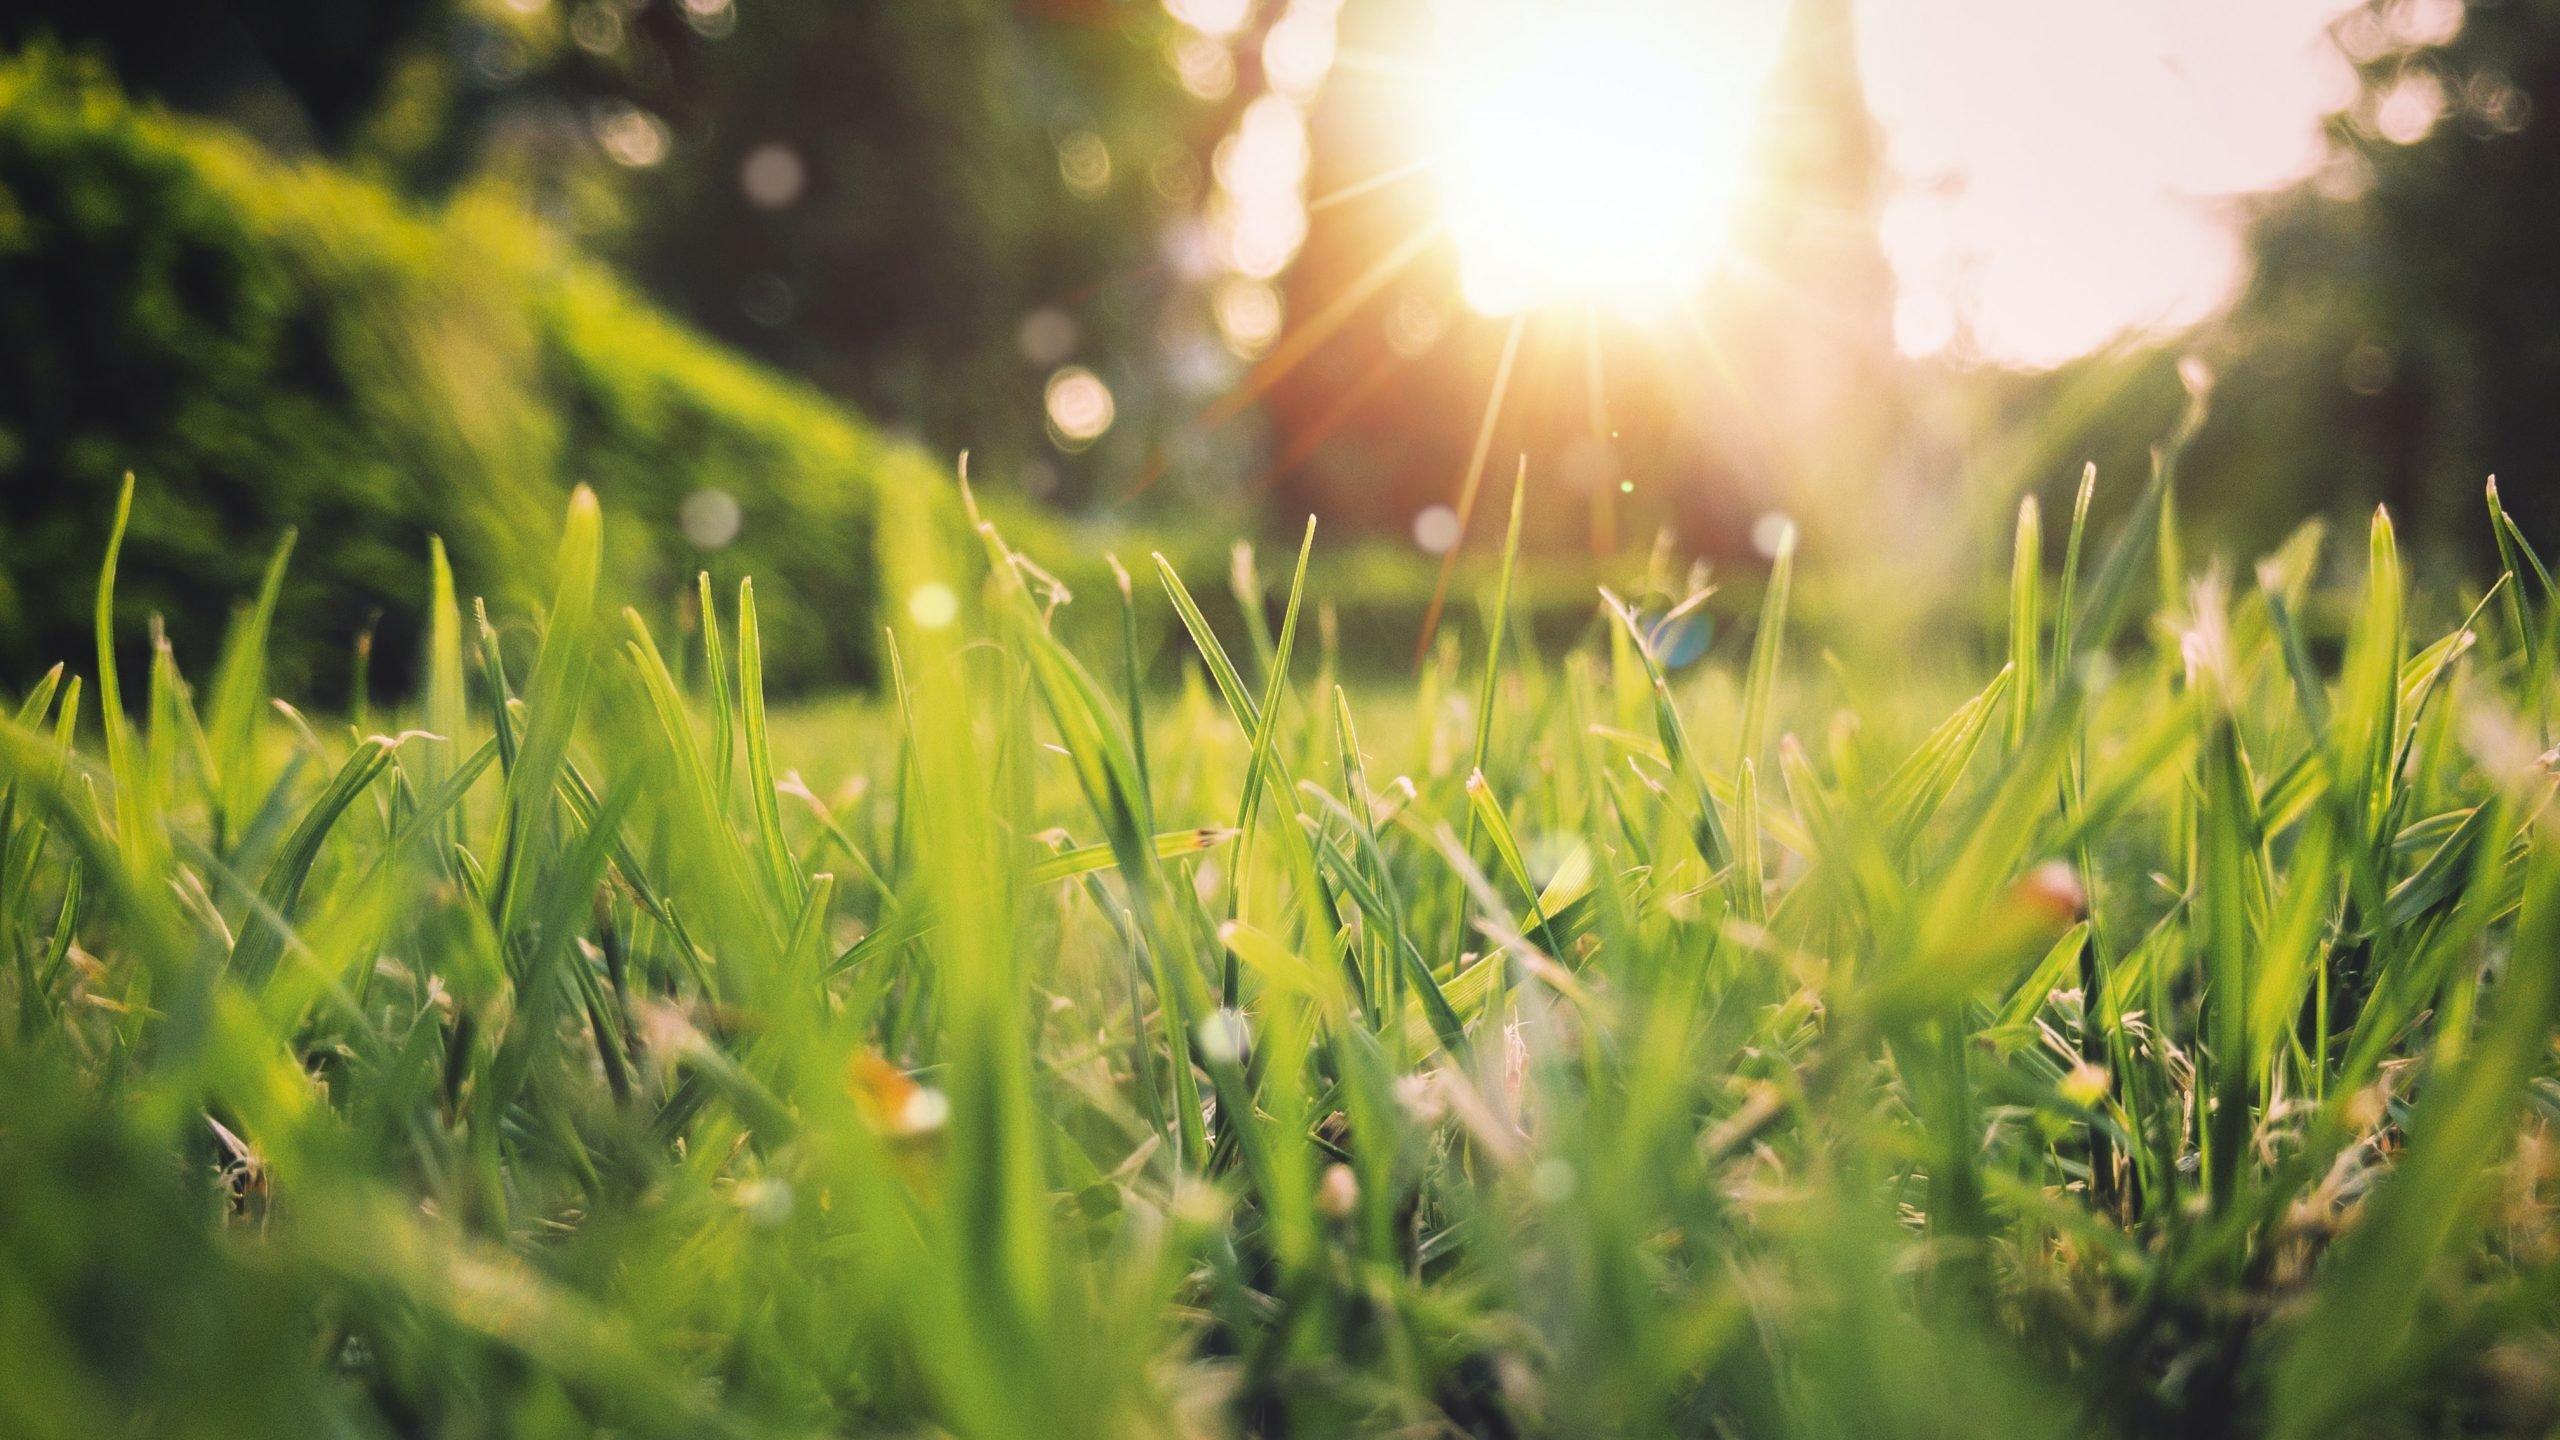 green grass field sunset scenery